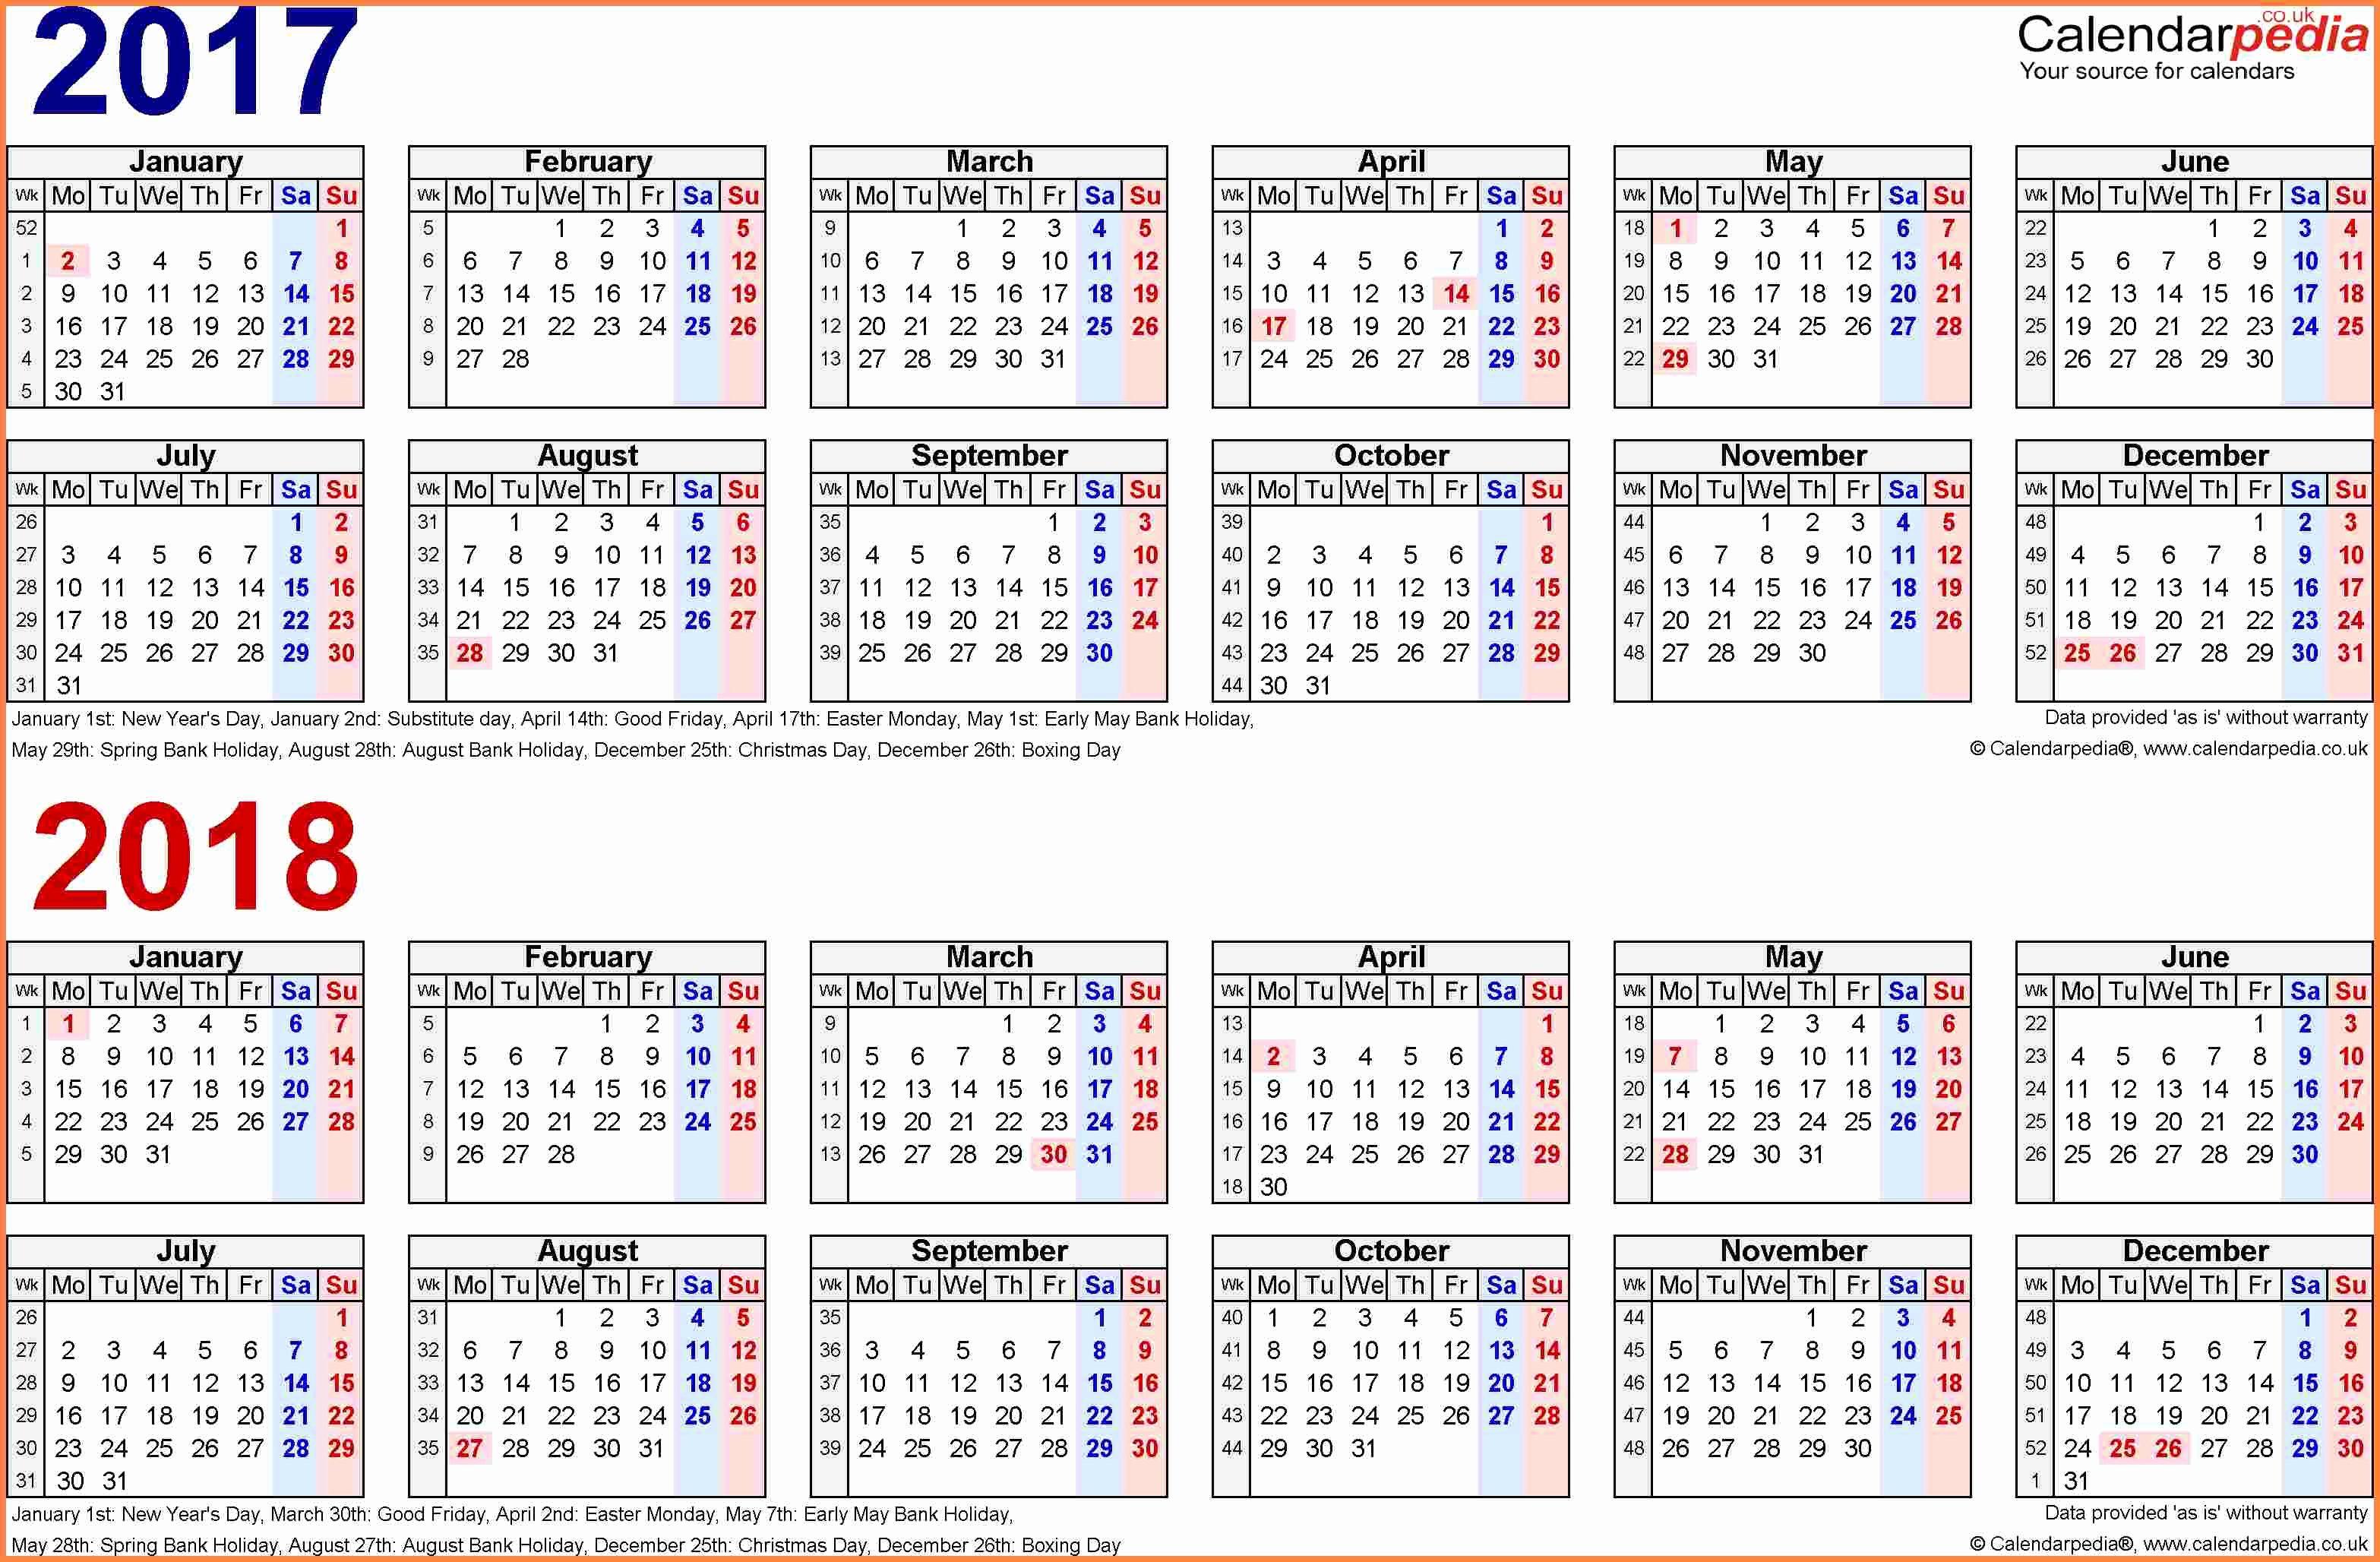 2018 Calendar Biweekly Payroll – 2018 New Year